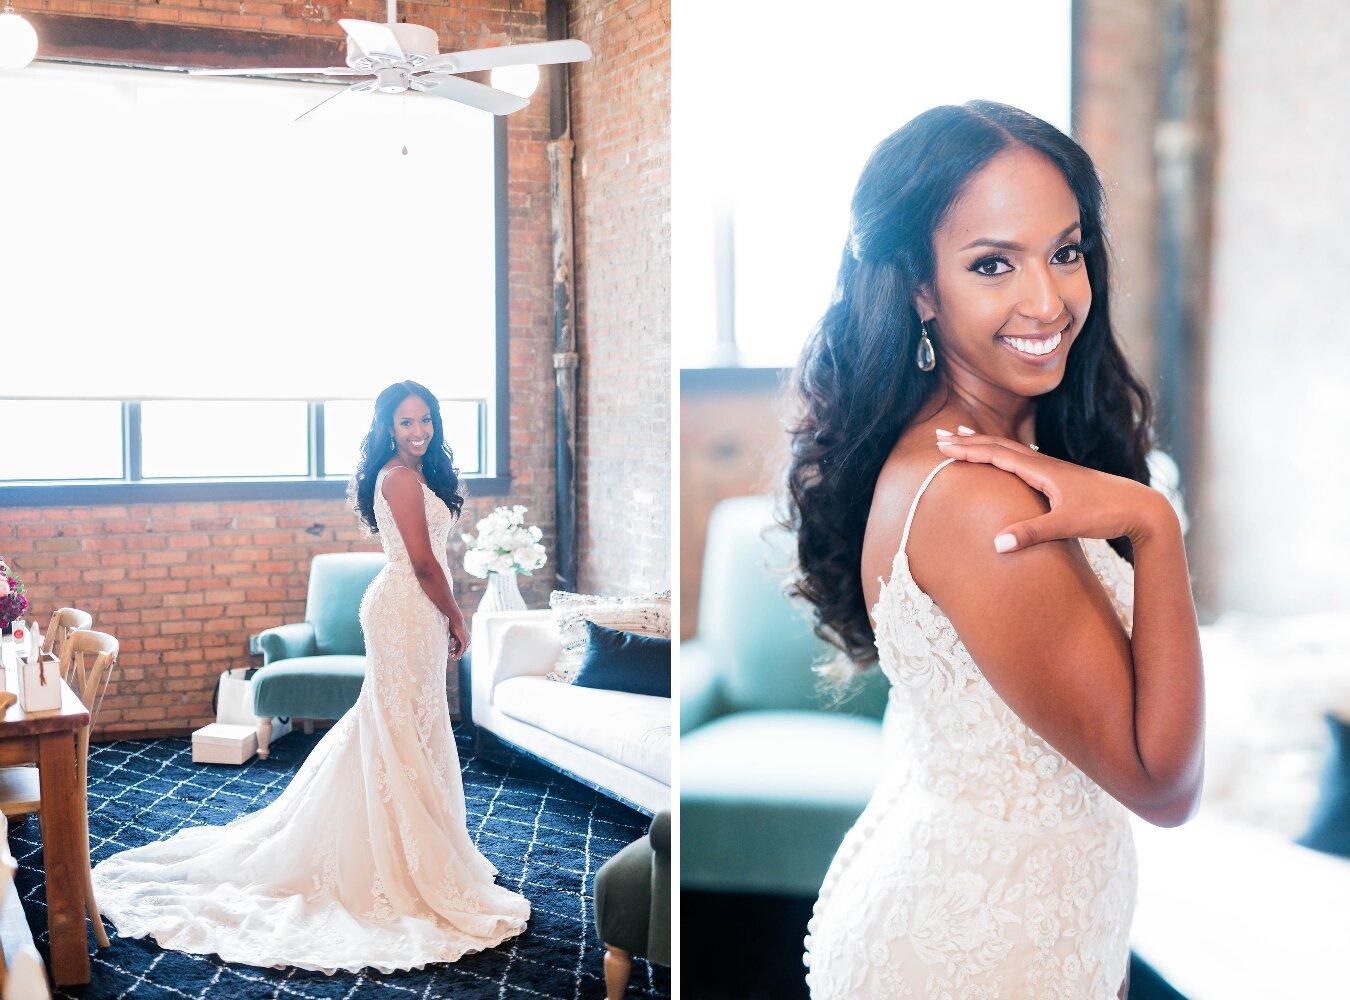 Dallas Wedding- Pharris Photography- Getting Ready- Sophie + Kellen -Bride